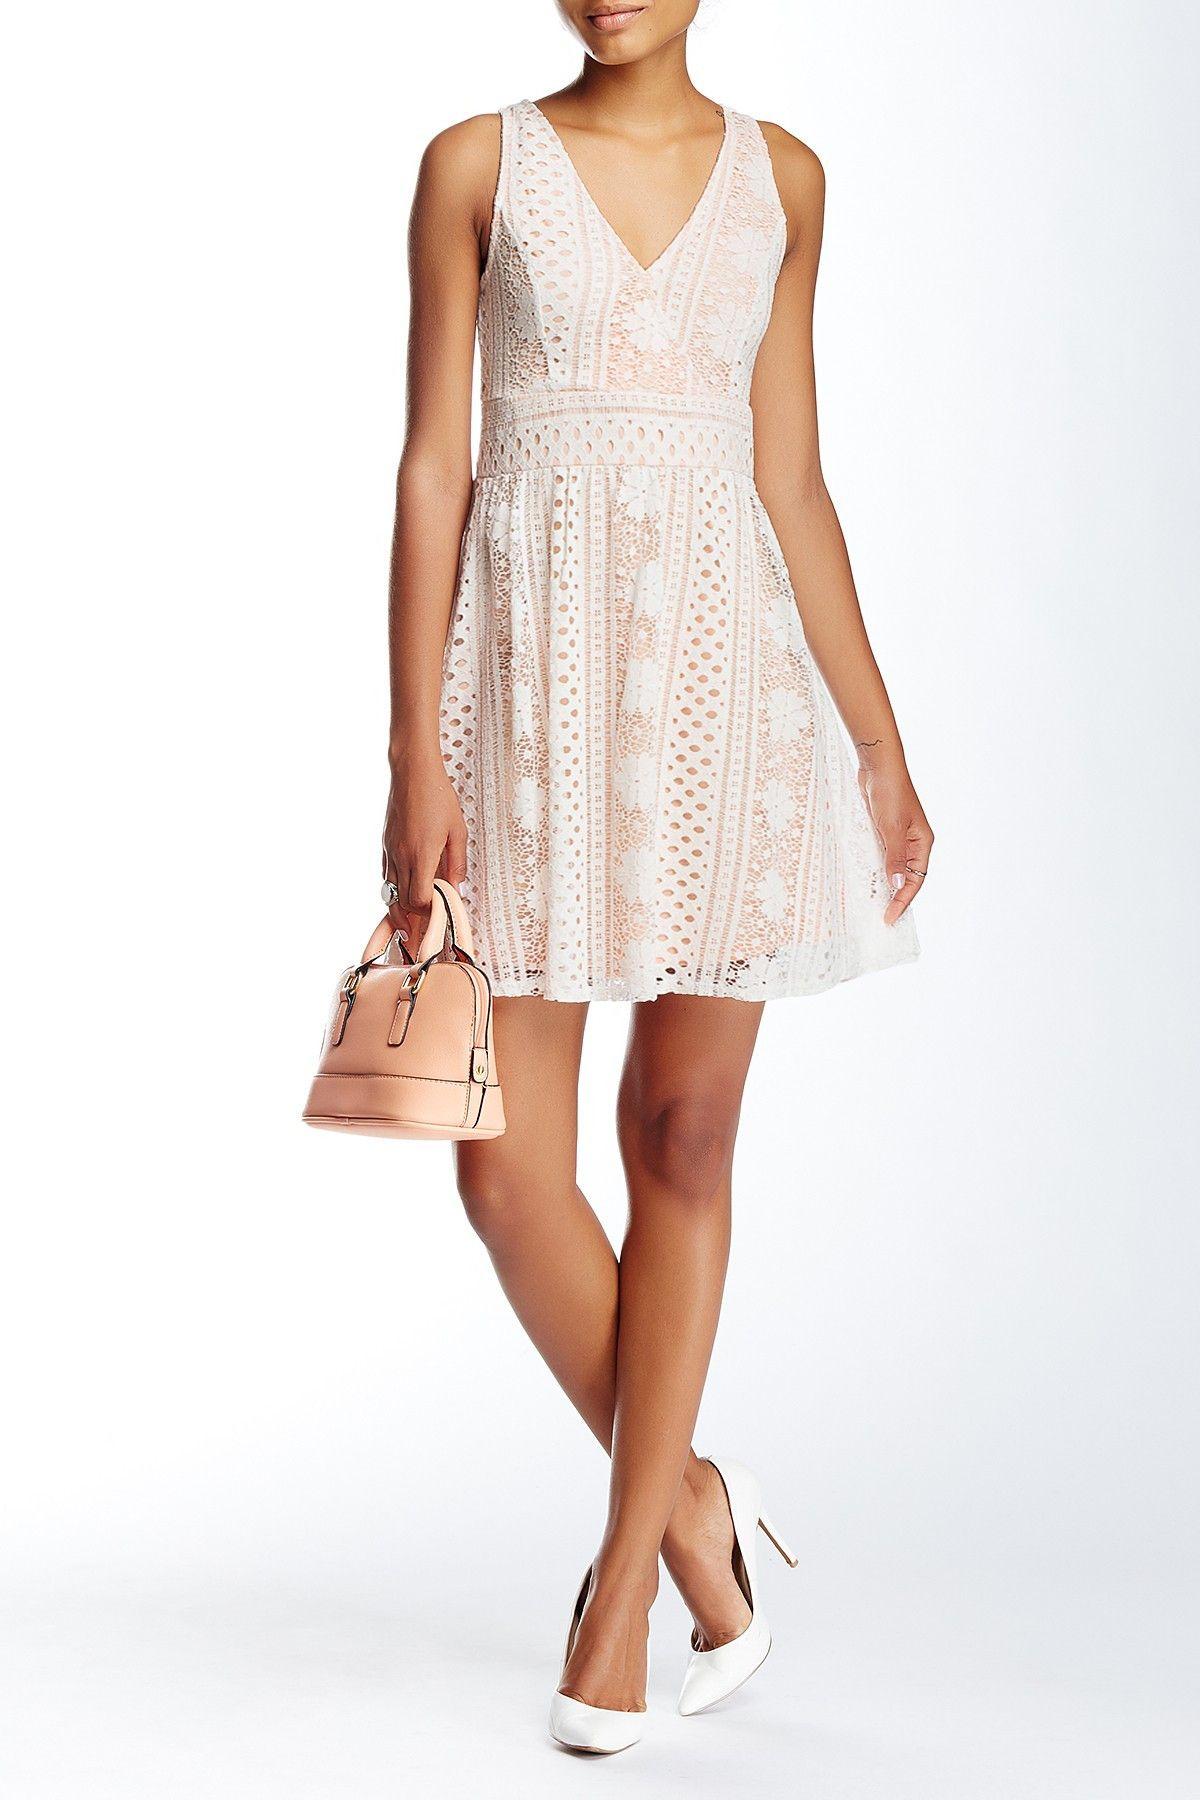 2 piece crop top wedding dress  Soieblu  Crochet Lace Fit u Flare Dress  HauteLook  Dream